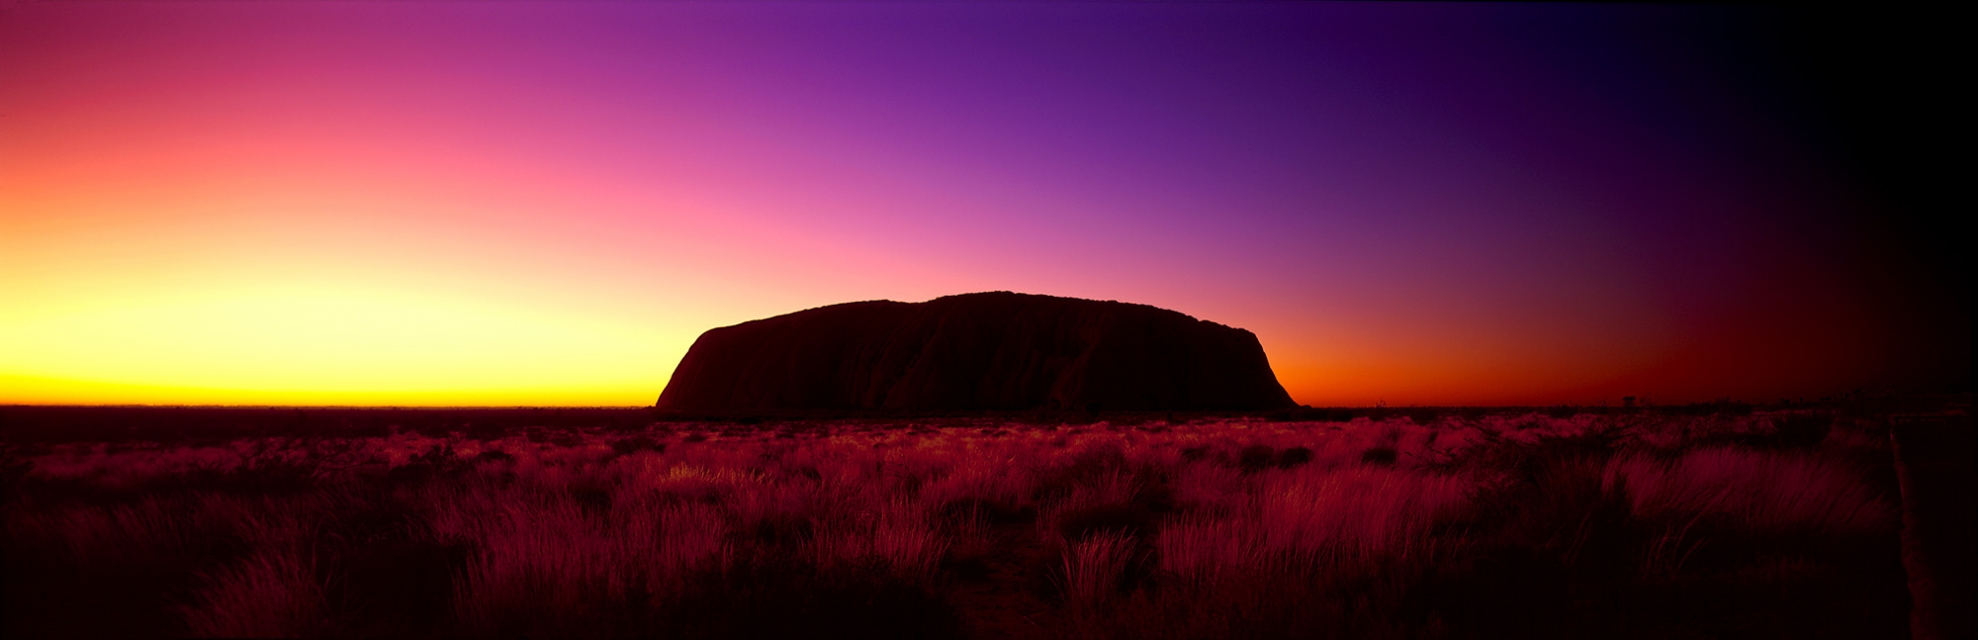 Ayers-Rock-Uluru-dawn-buy-limited-edition-photography-ric-steininger-Aura